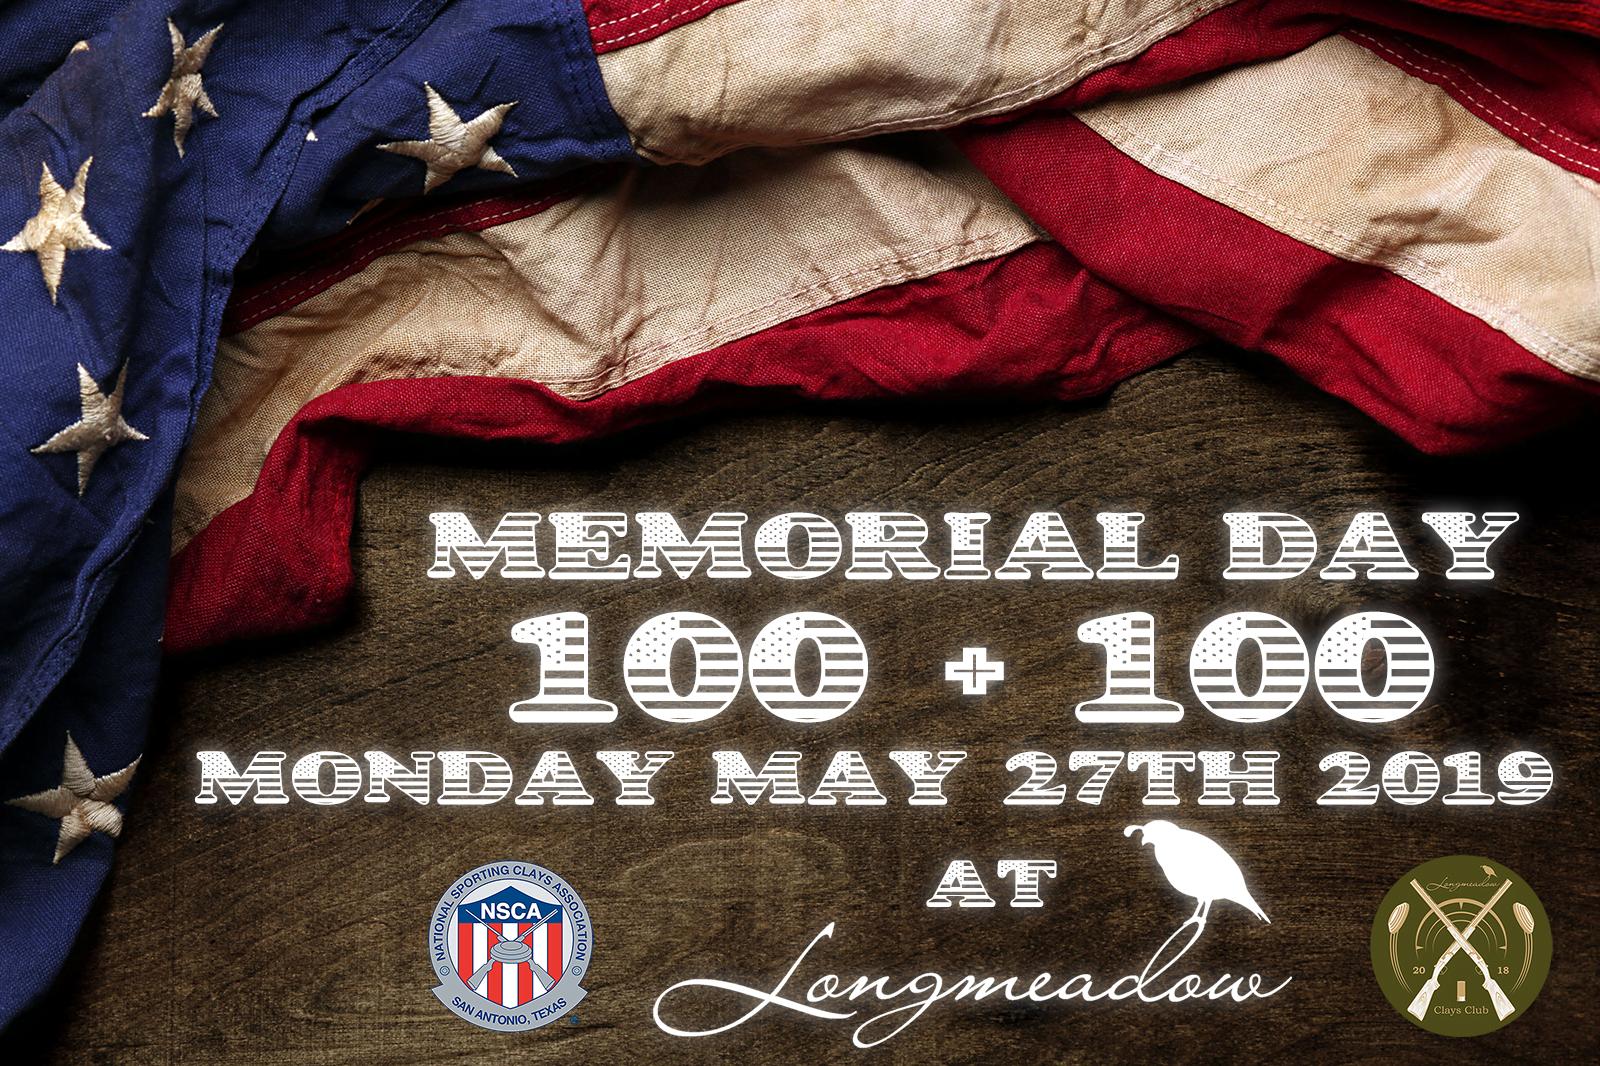 Longmeadow 100 + 100 Memorial Day 2019